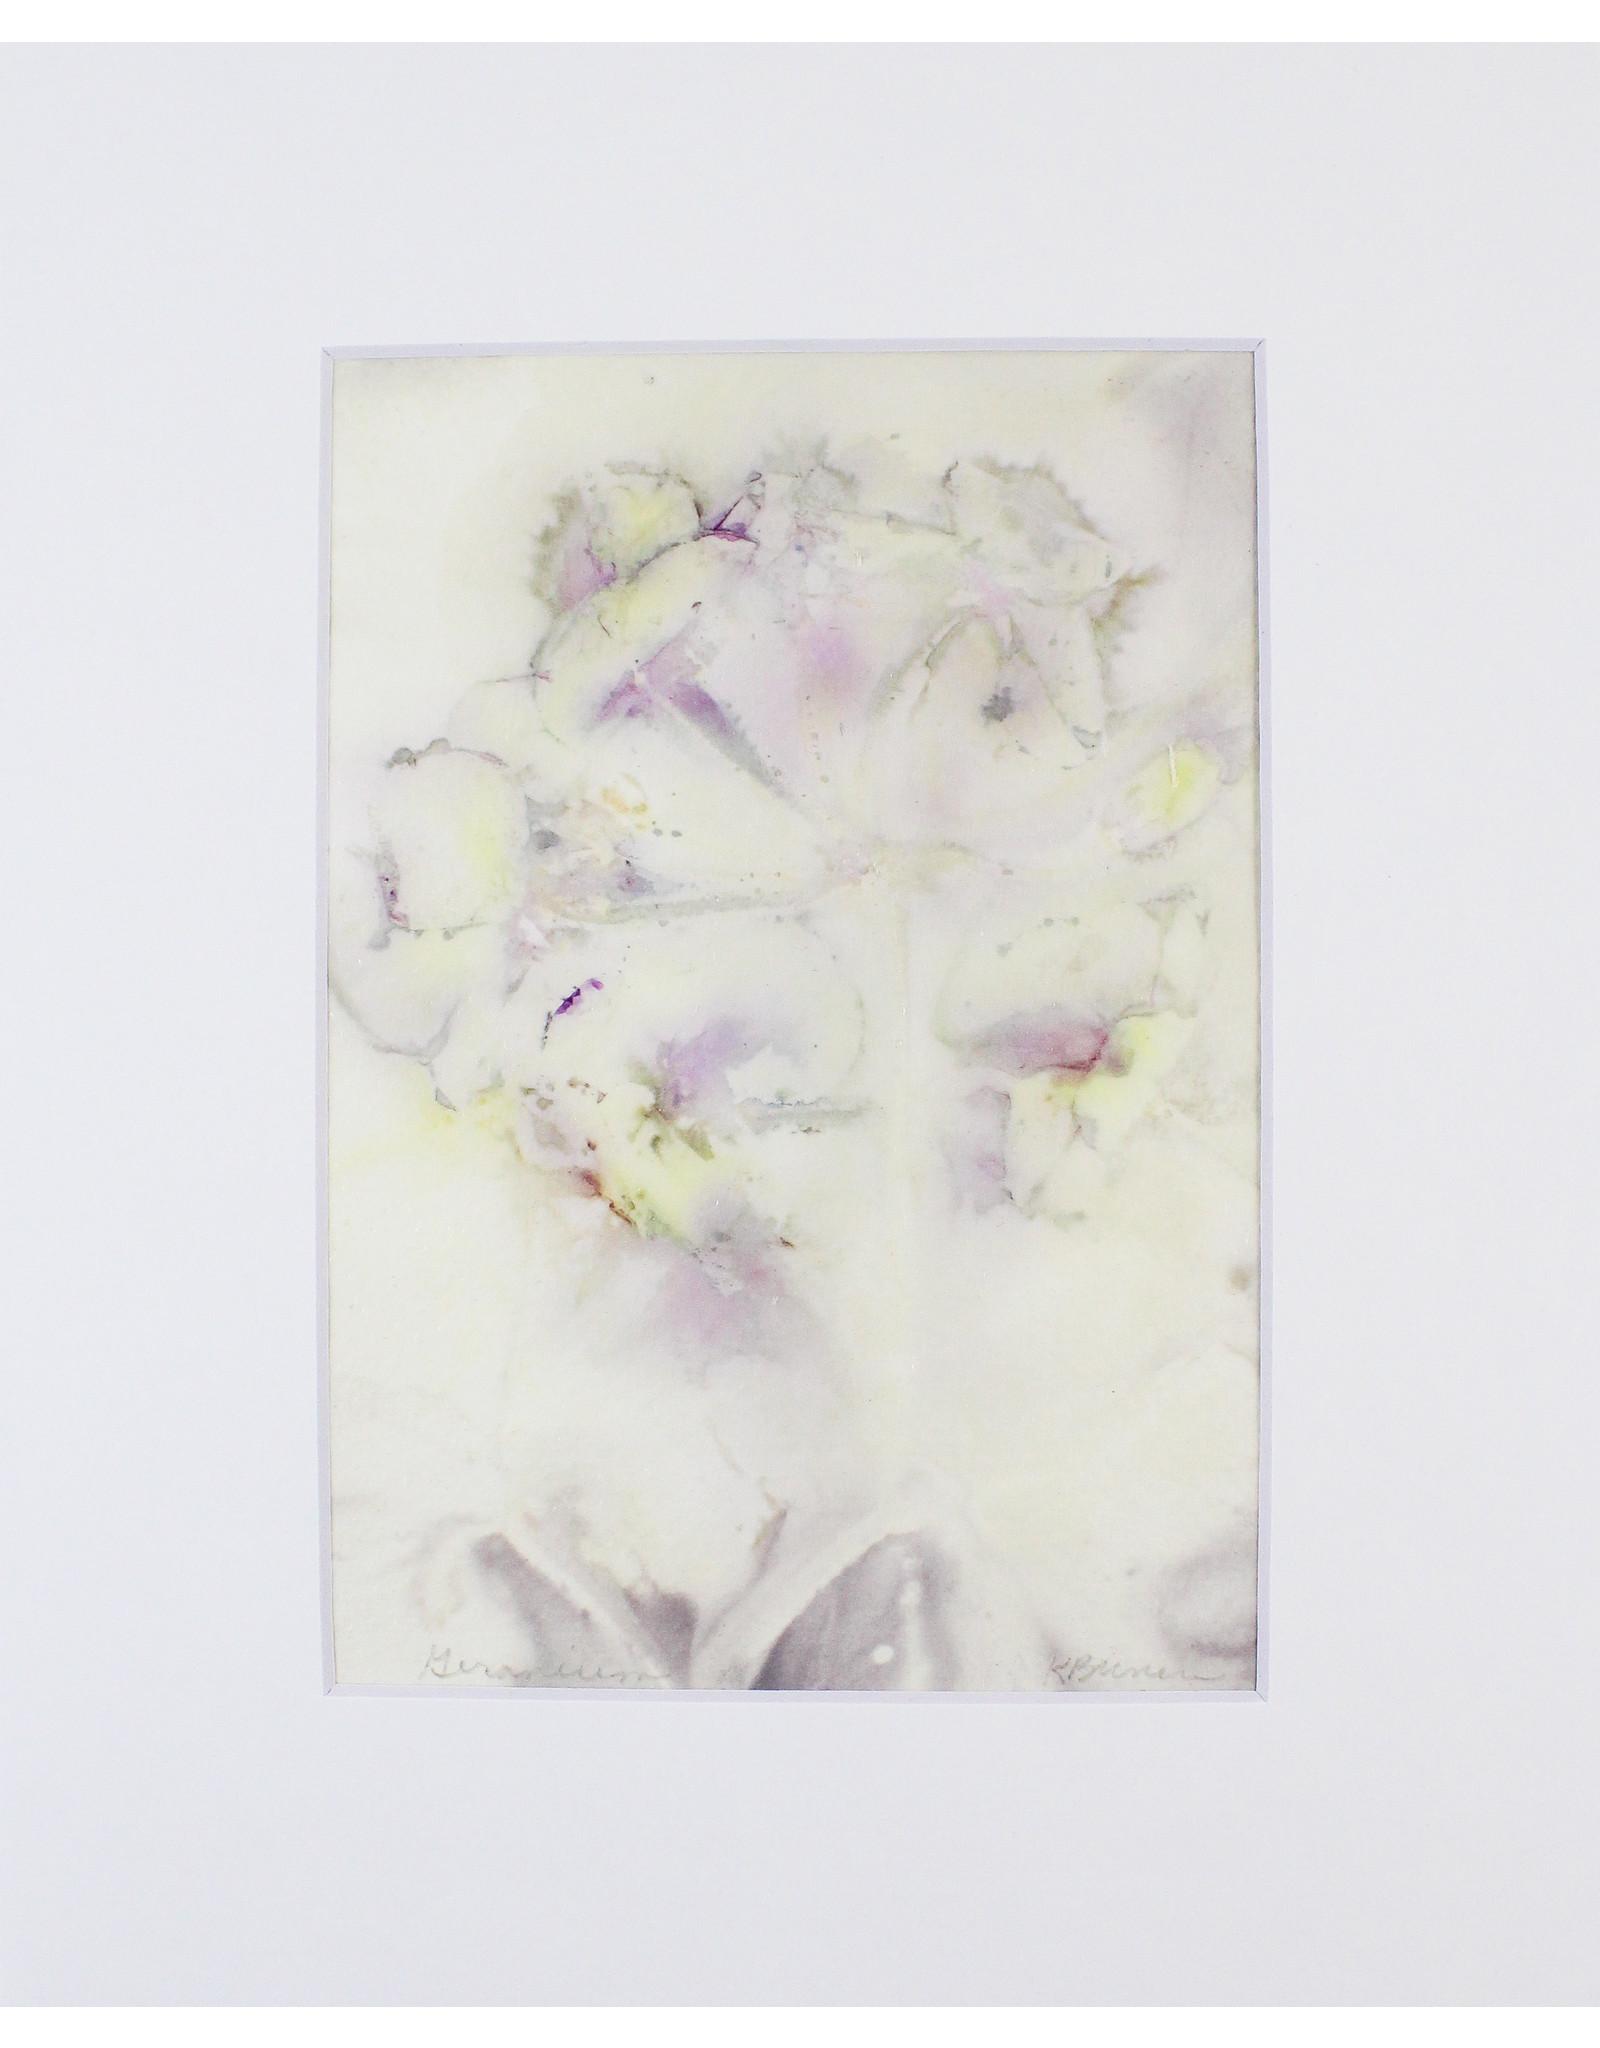 Kathleen Bunin Botanical Prints (8x10 Matted) by Kathleen Bunin